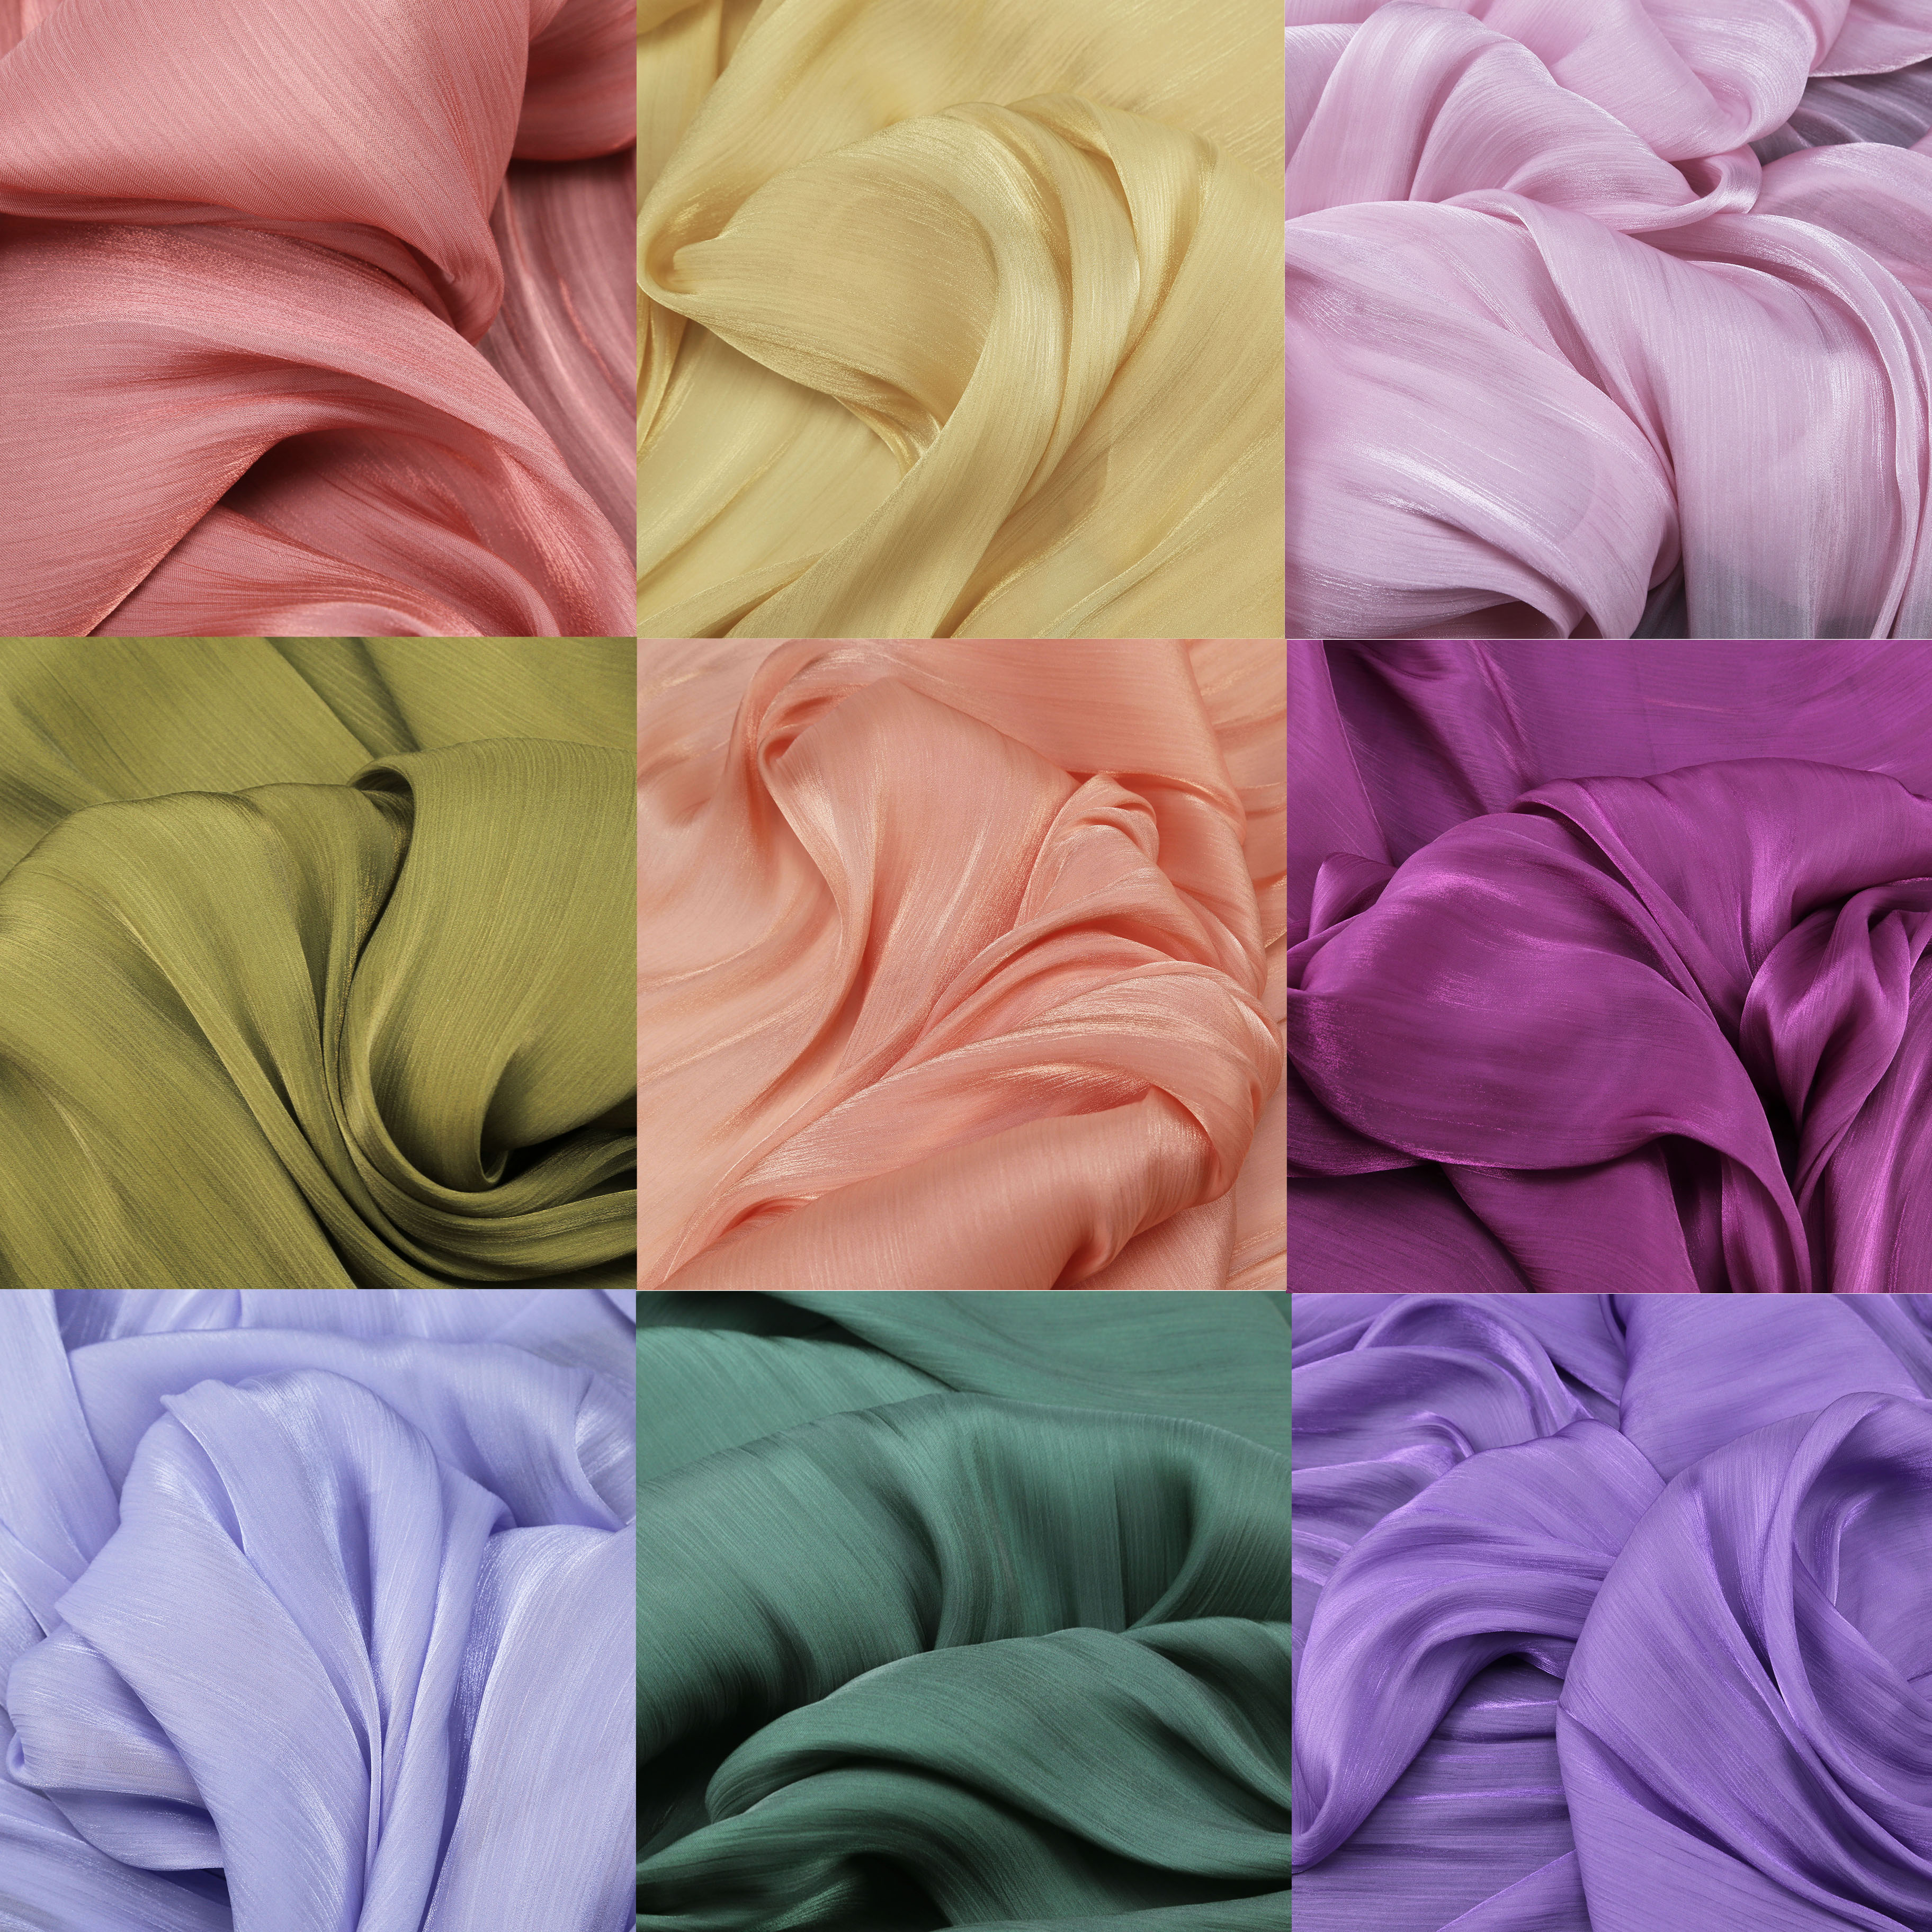 Spring streamer soft crystal satin fabric silky elegant shirt dress horse skirt Hanfu fabric by the meter 30-1